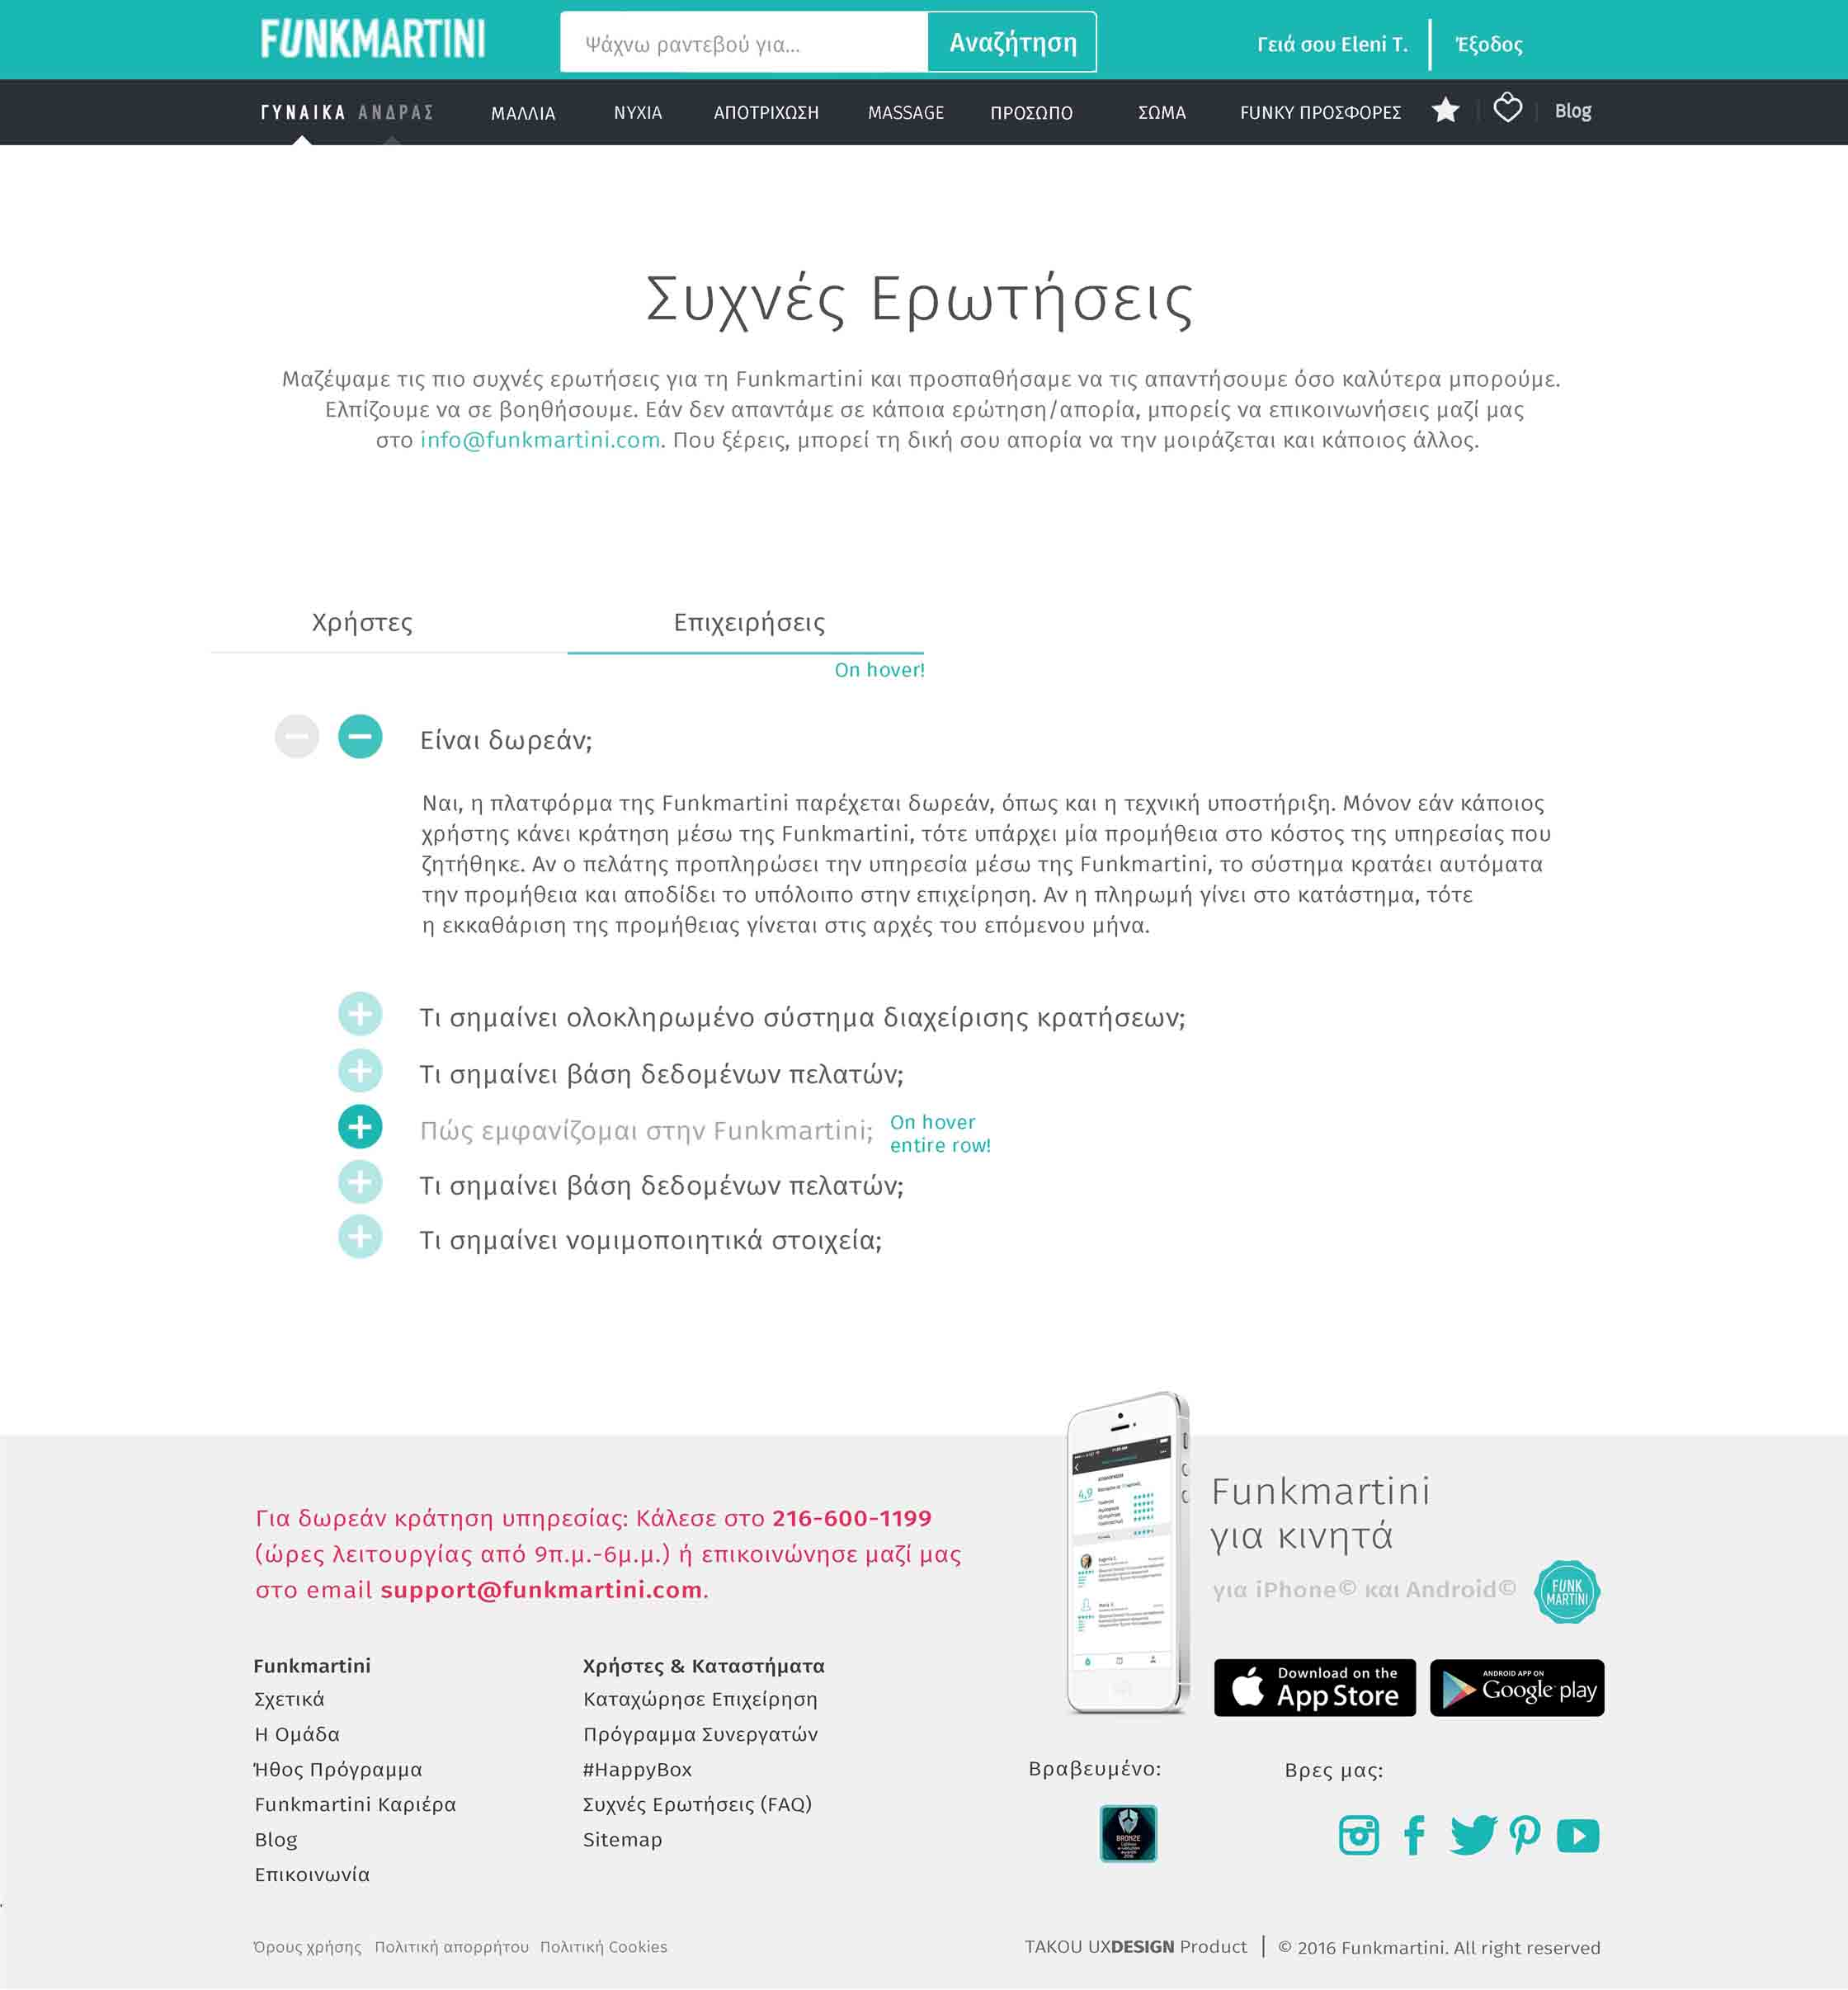 Synkt_FAQ Funkmartini_Top Page_Ite 2